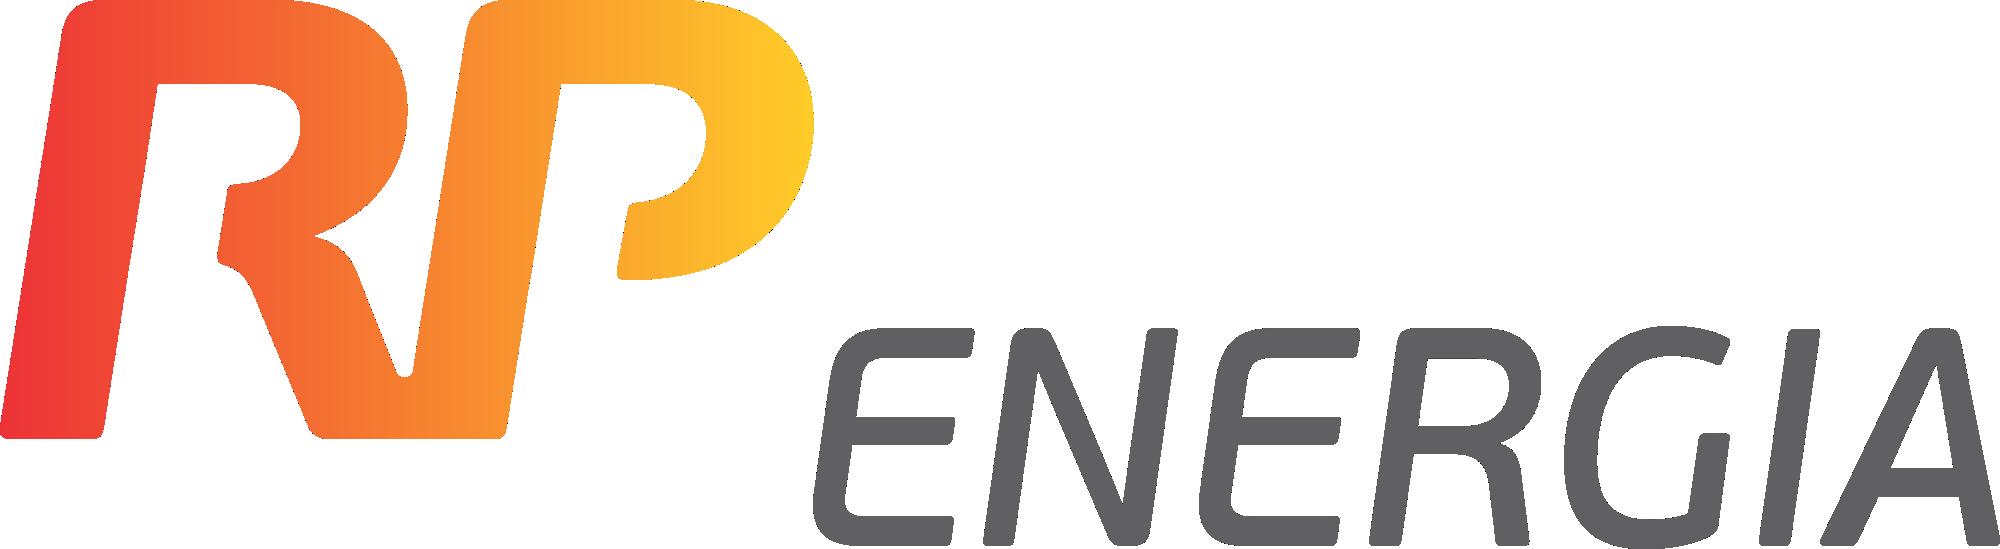 rp energia - marca.png